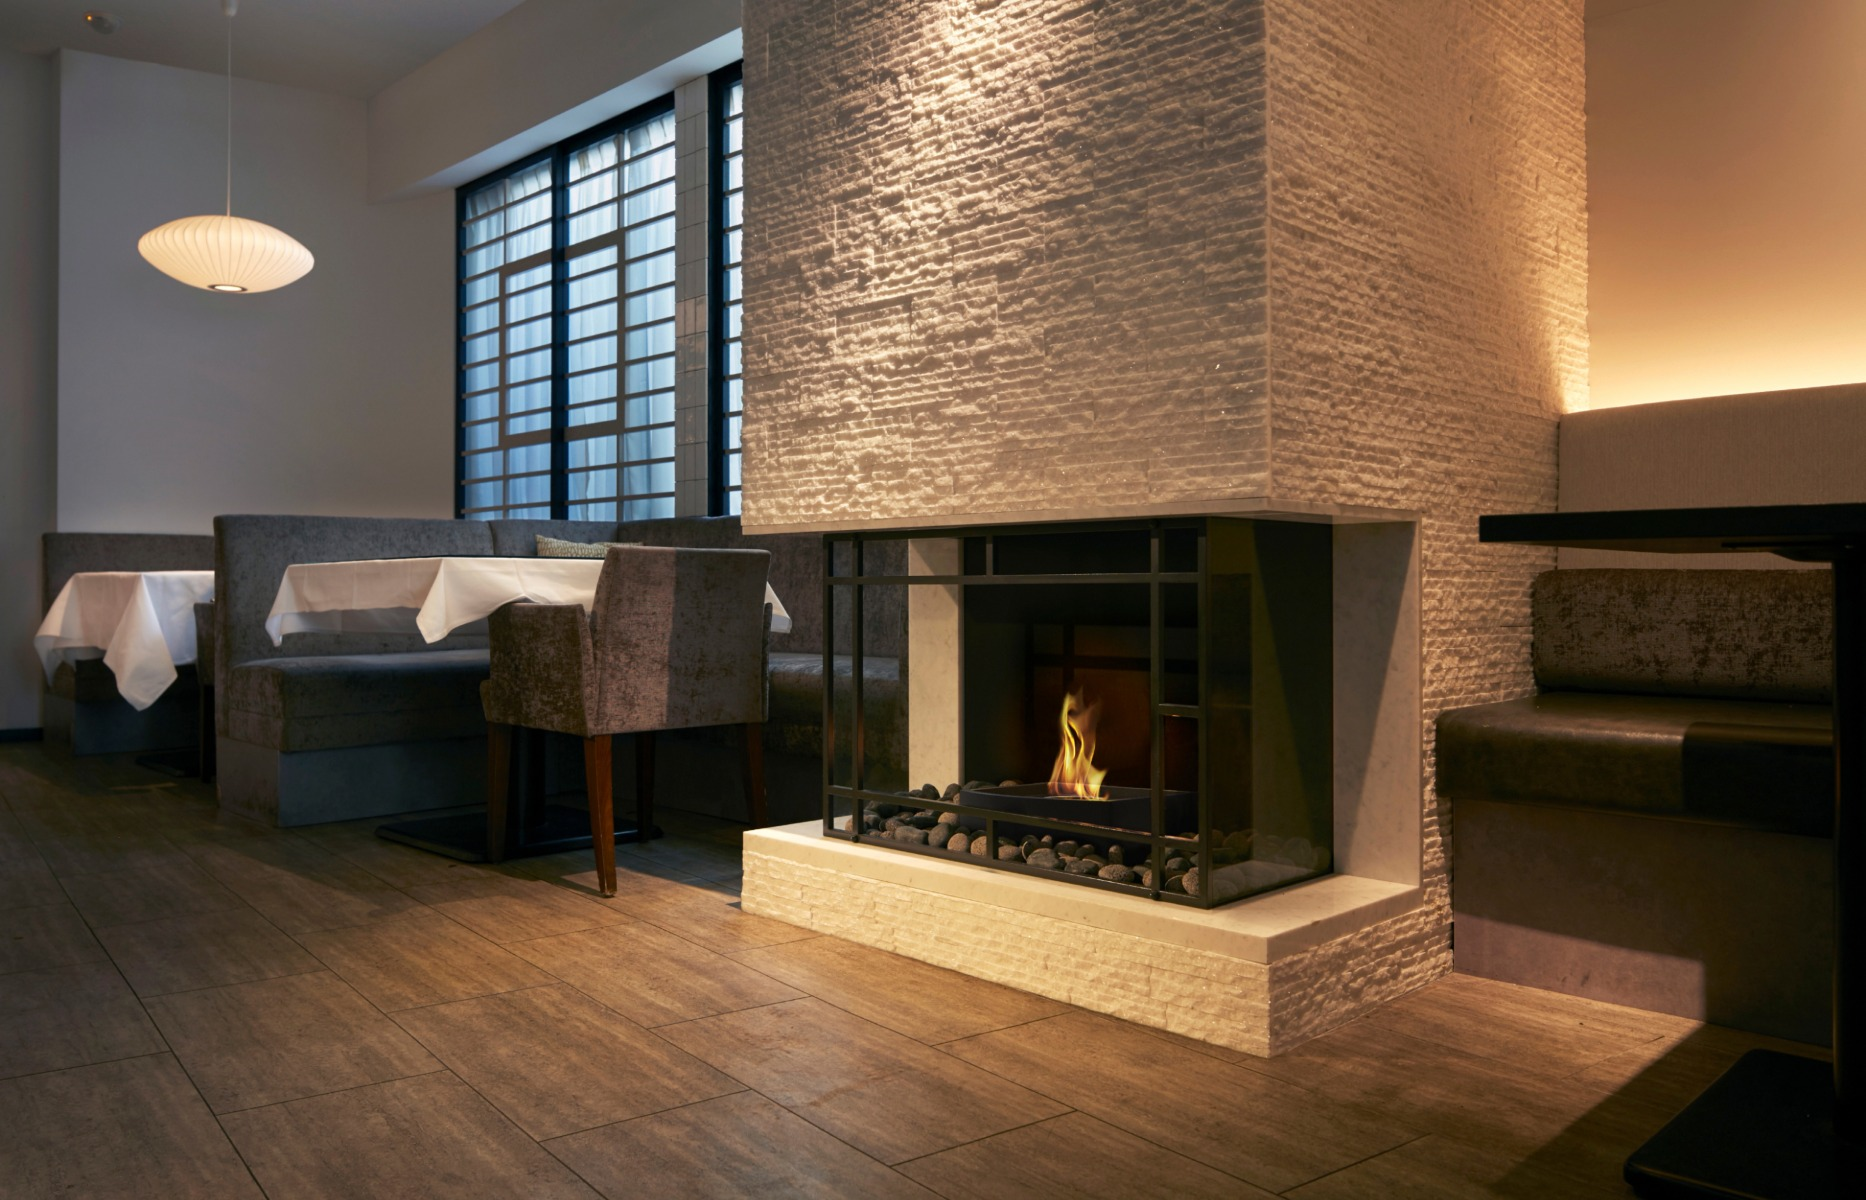 EcoSmart Fire grate 18 fireplace